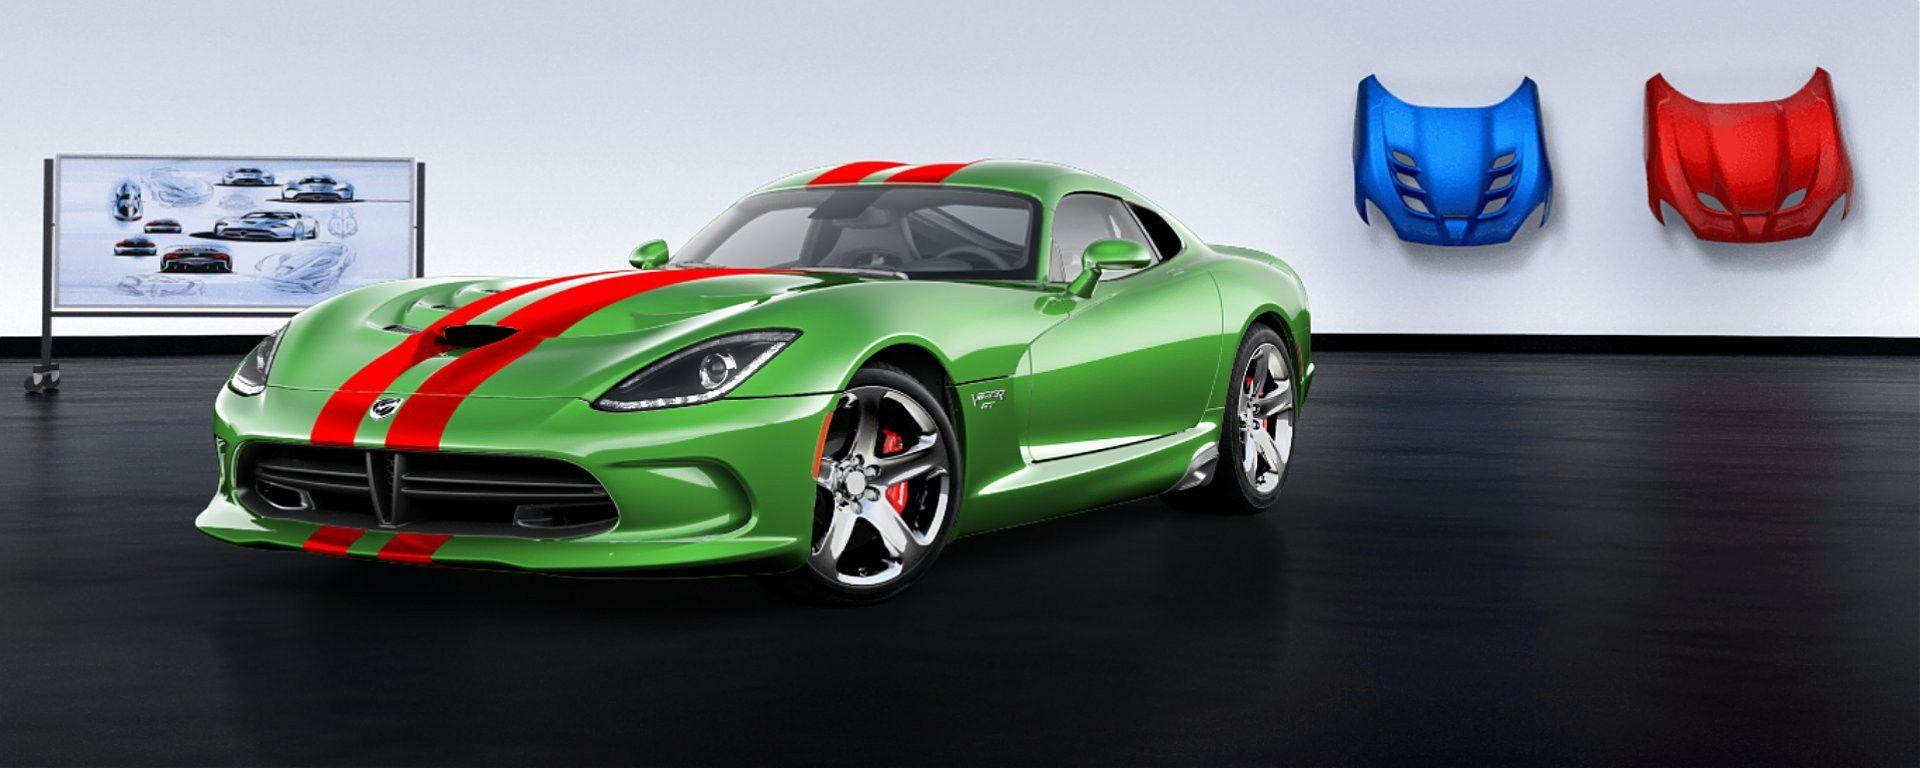 Dodge Viper 2016: una, nessuna, 50milioni